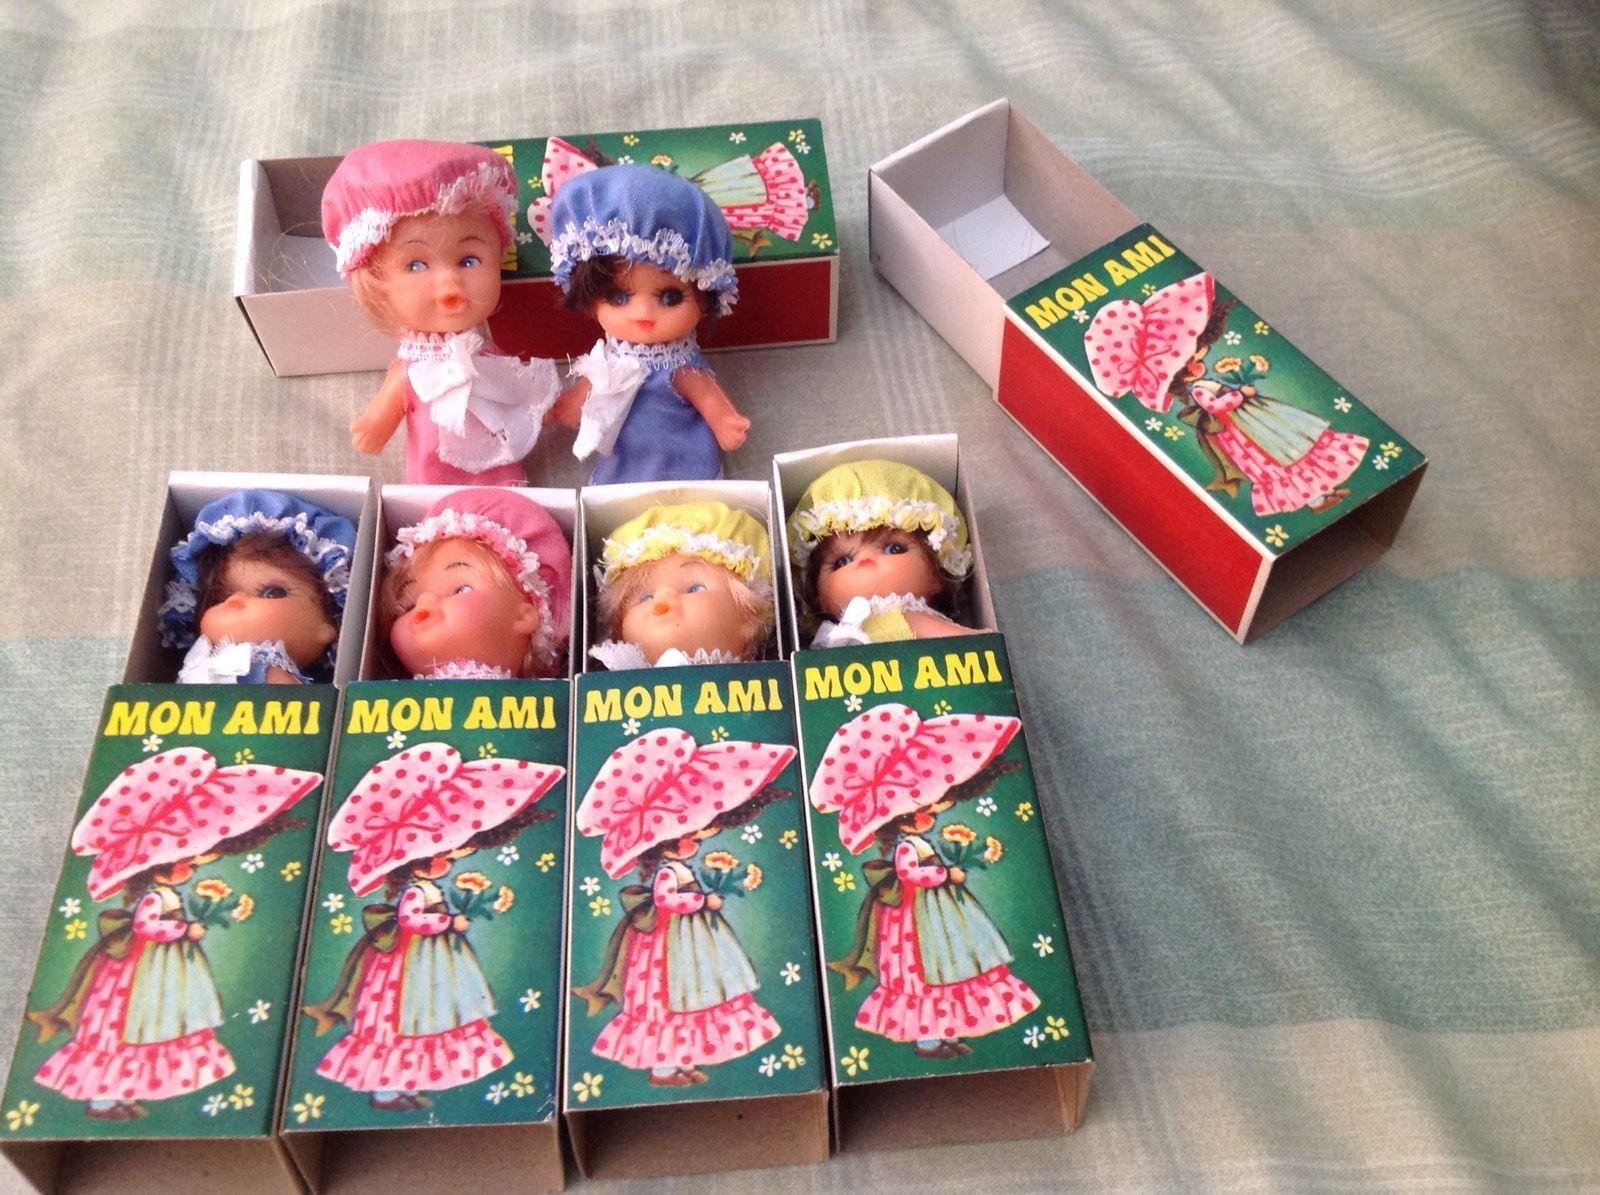 Rare Vintage Mon Ami Miniature Matchbox Doll | Vintage dolls, Dolls,  Matchbox